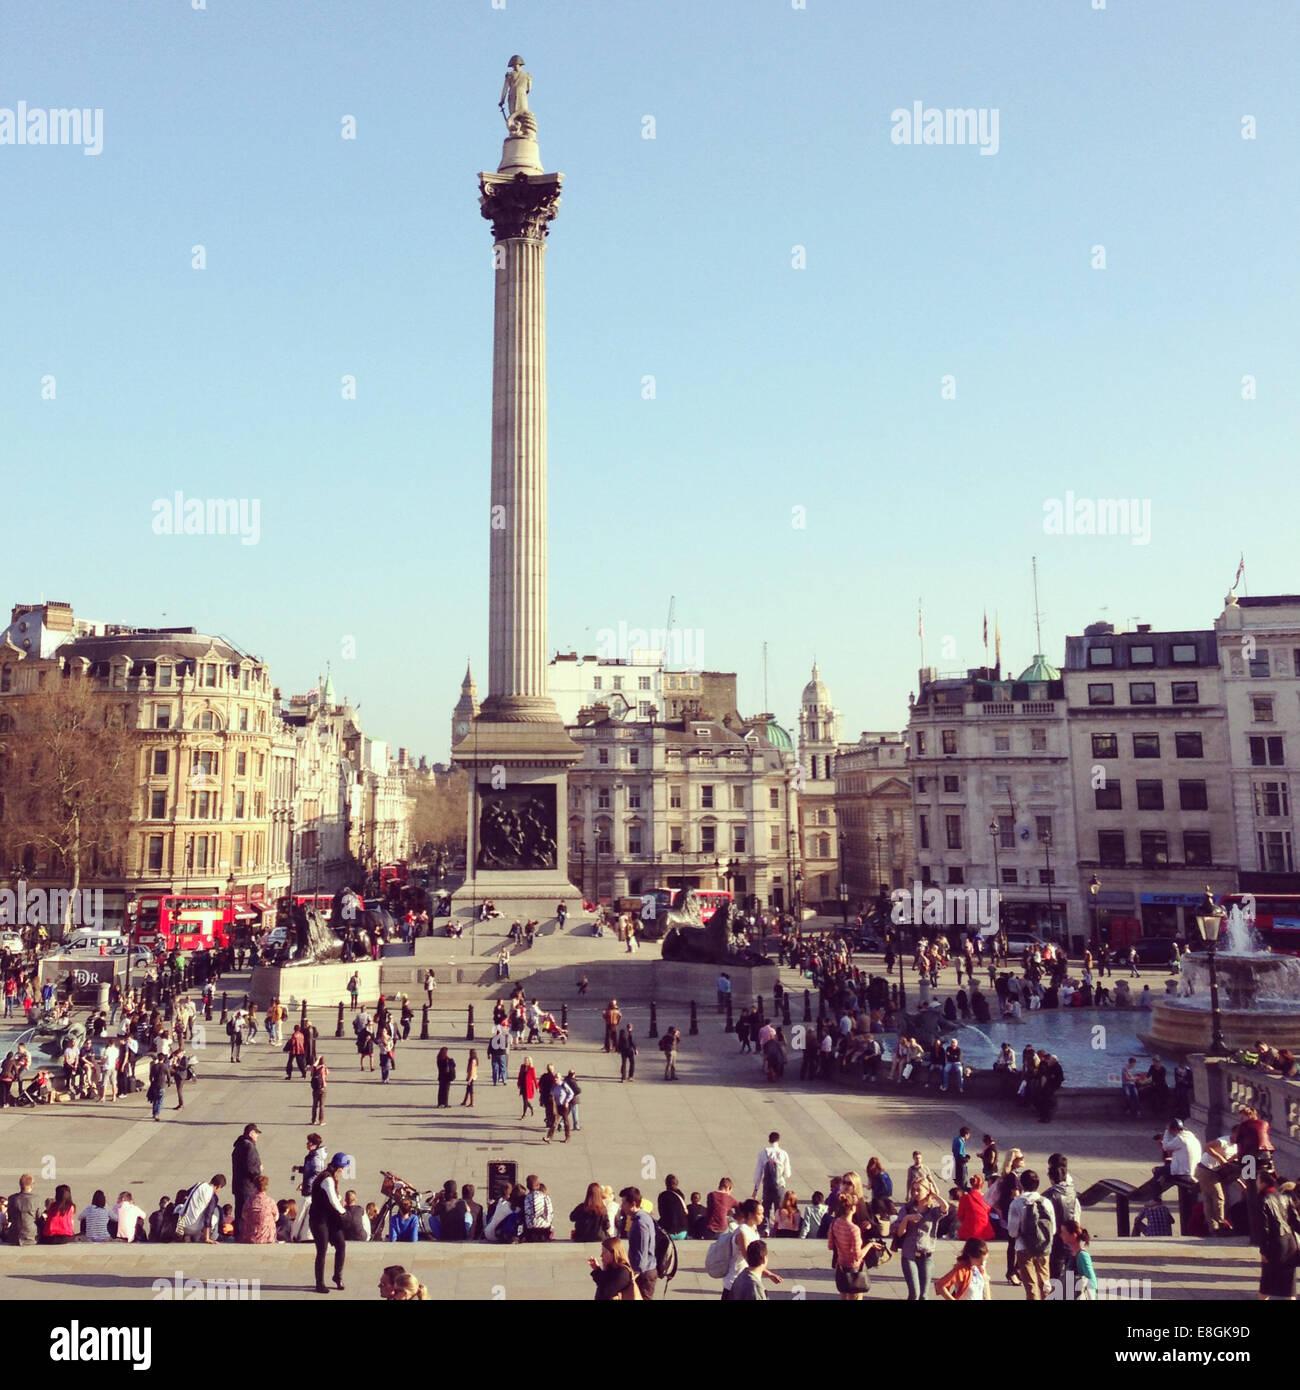 Reino Unido, Londres, columna en Trafalgar Square Imagen De Stock